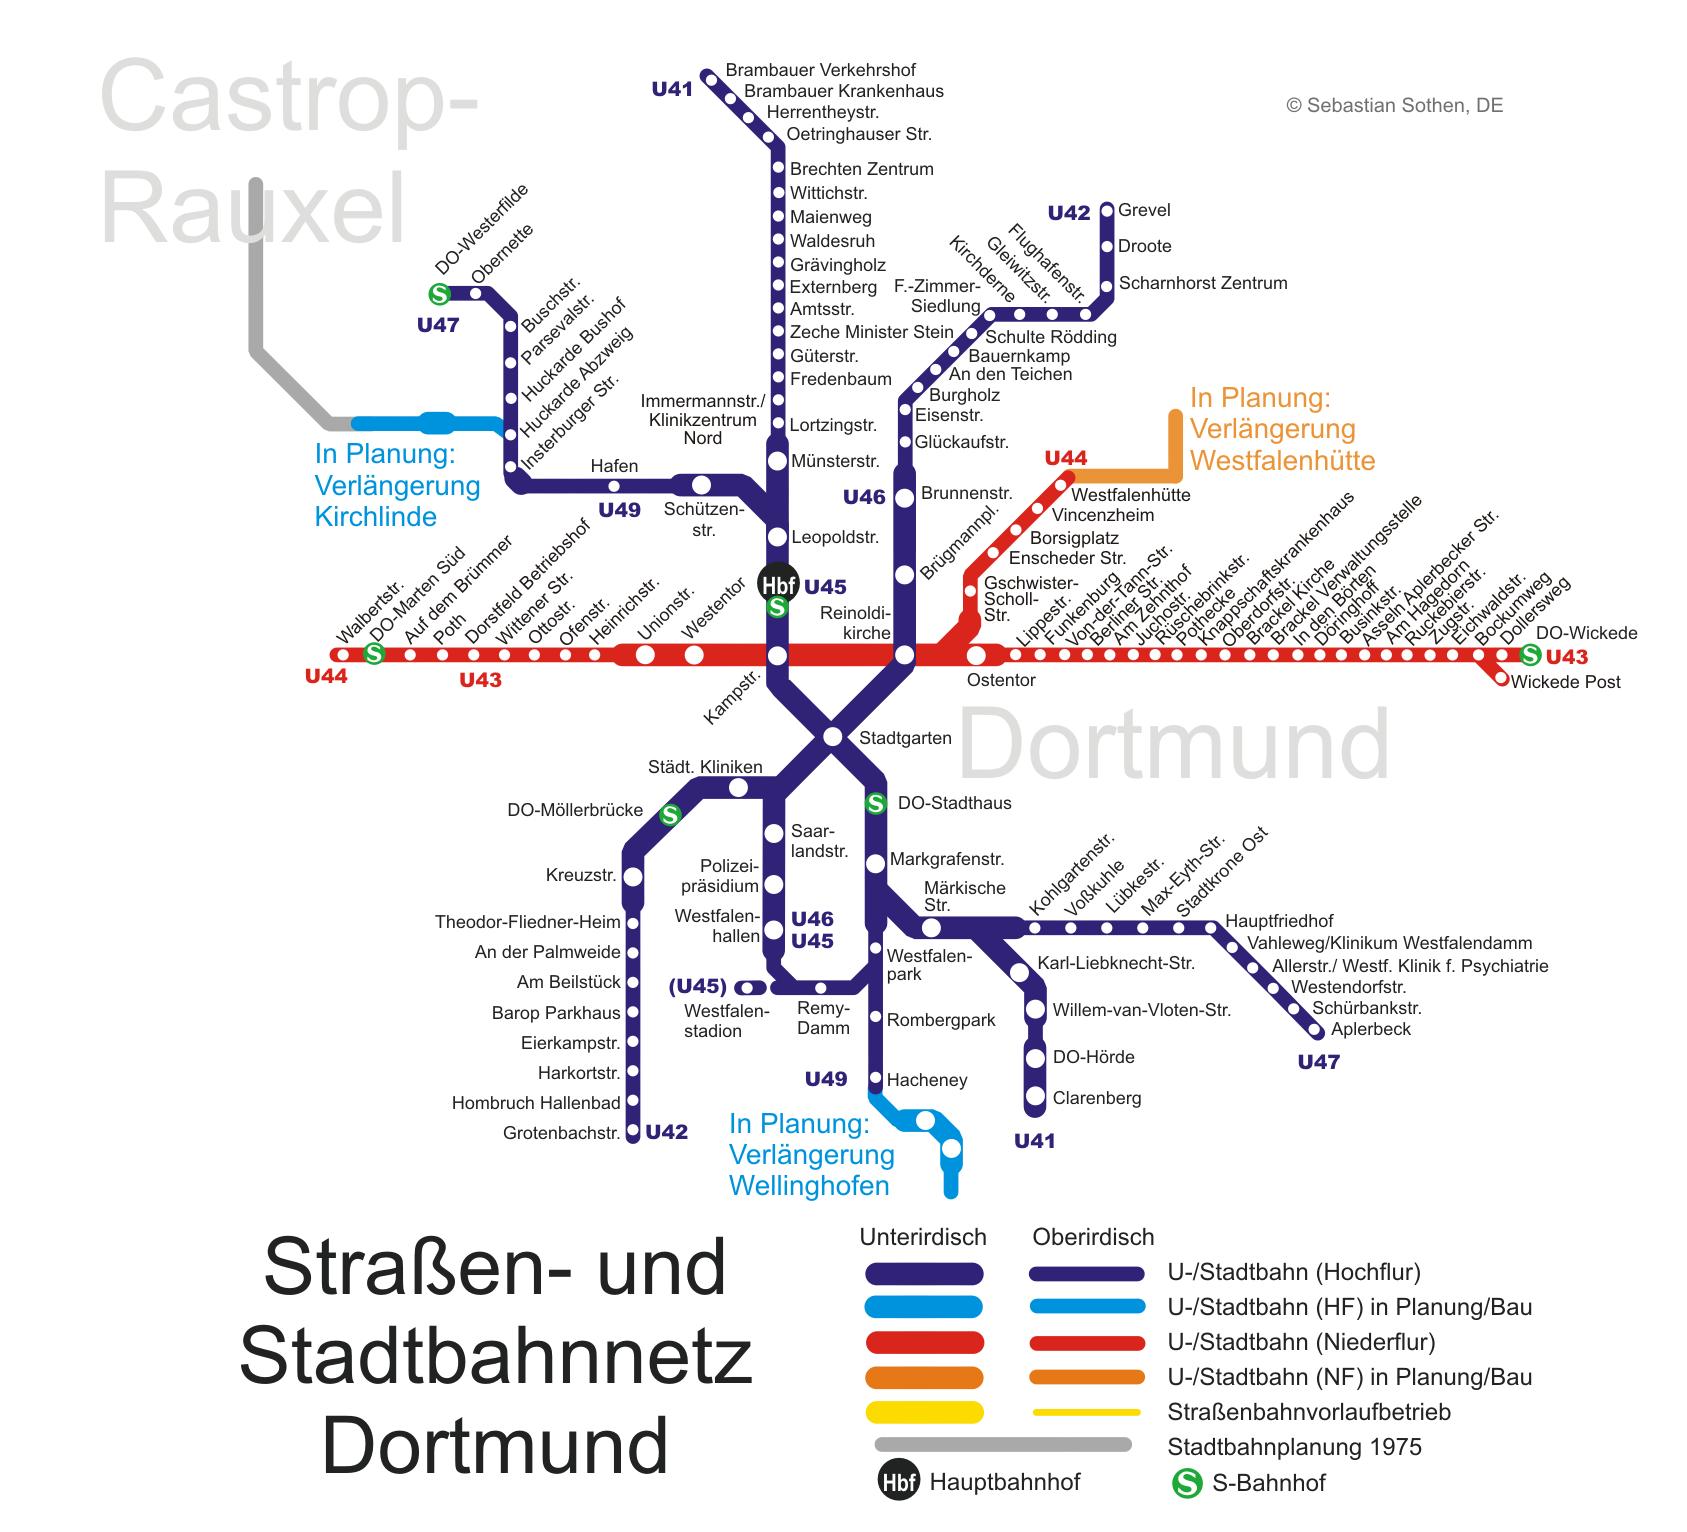 stadtbahn dortmund u bahn karte deutschland metros undergrounds and subways maps. Black Bedroom Furniture Sets. Home Design Ideas